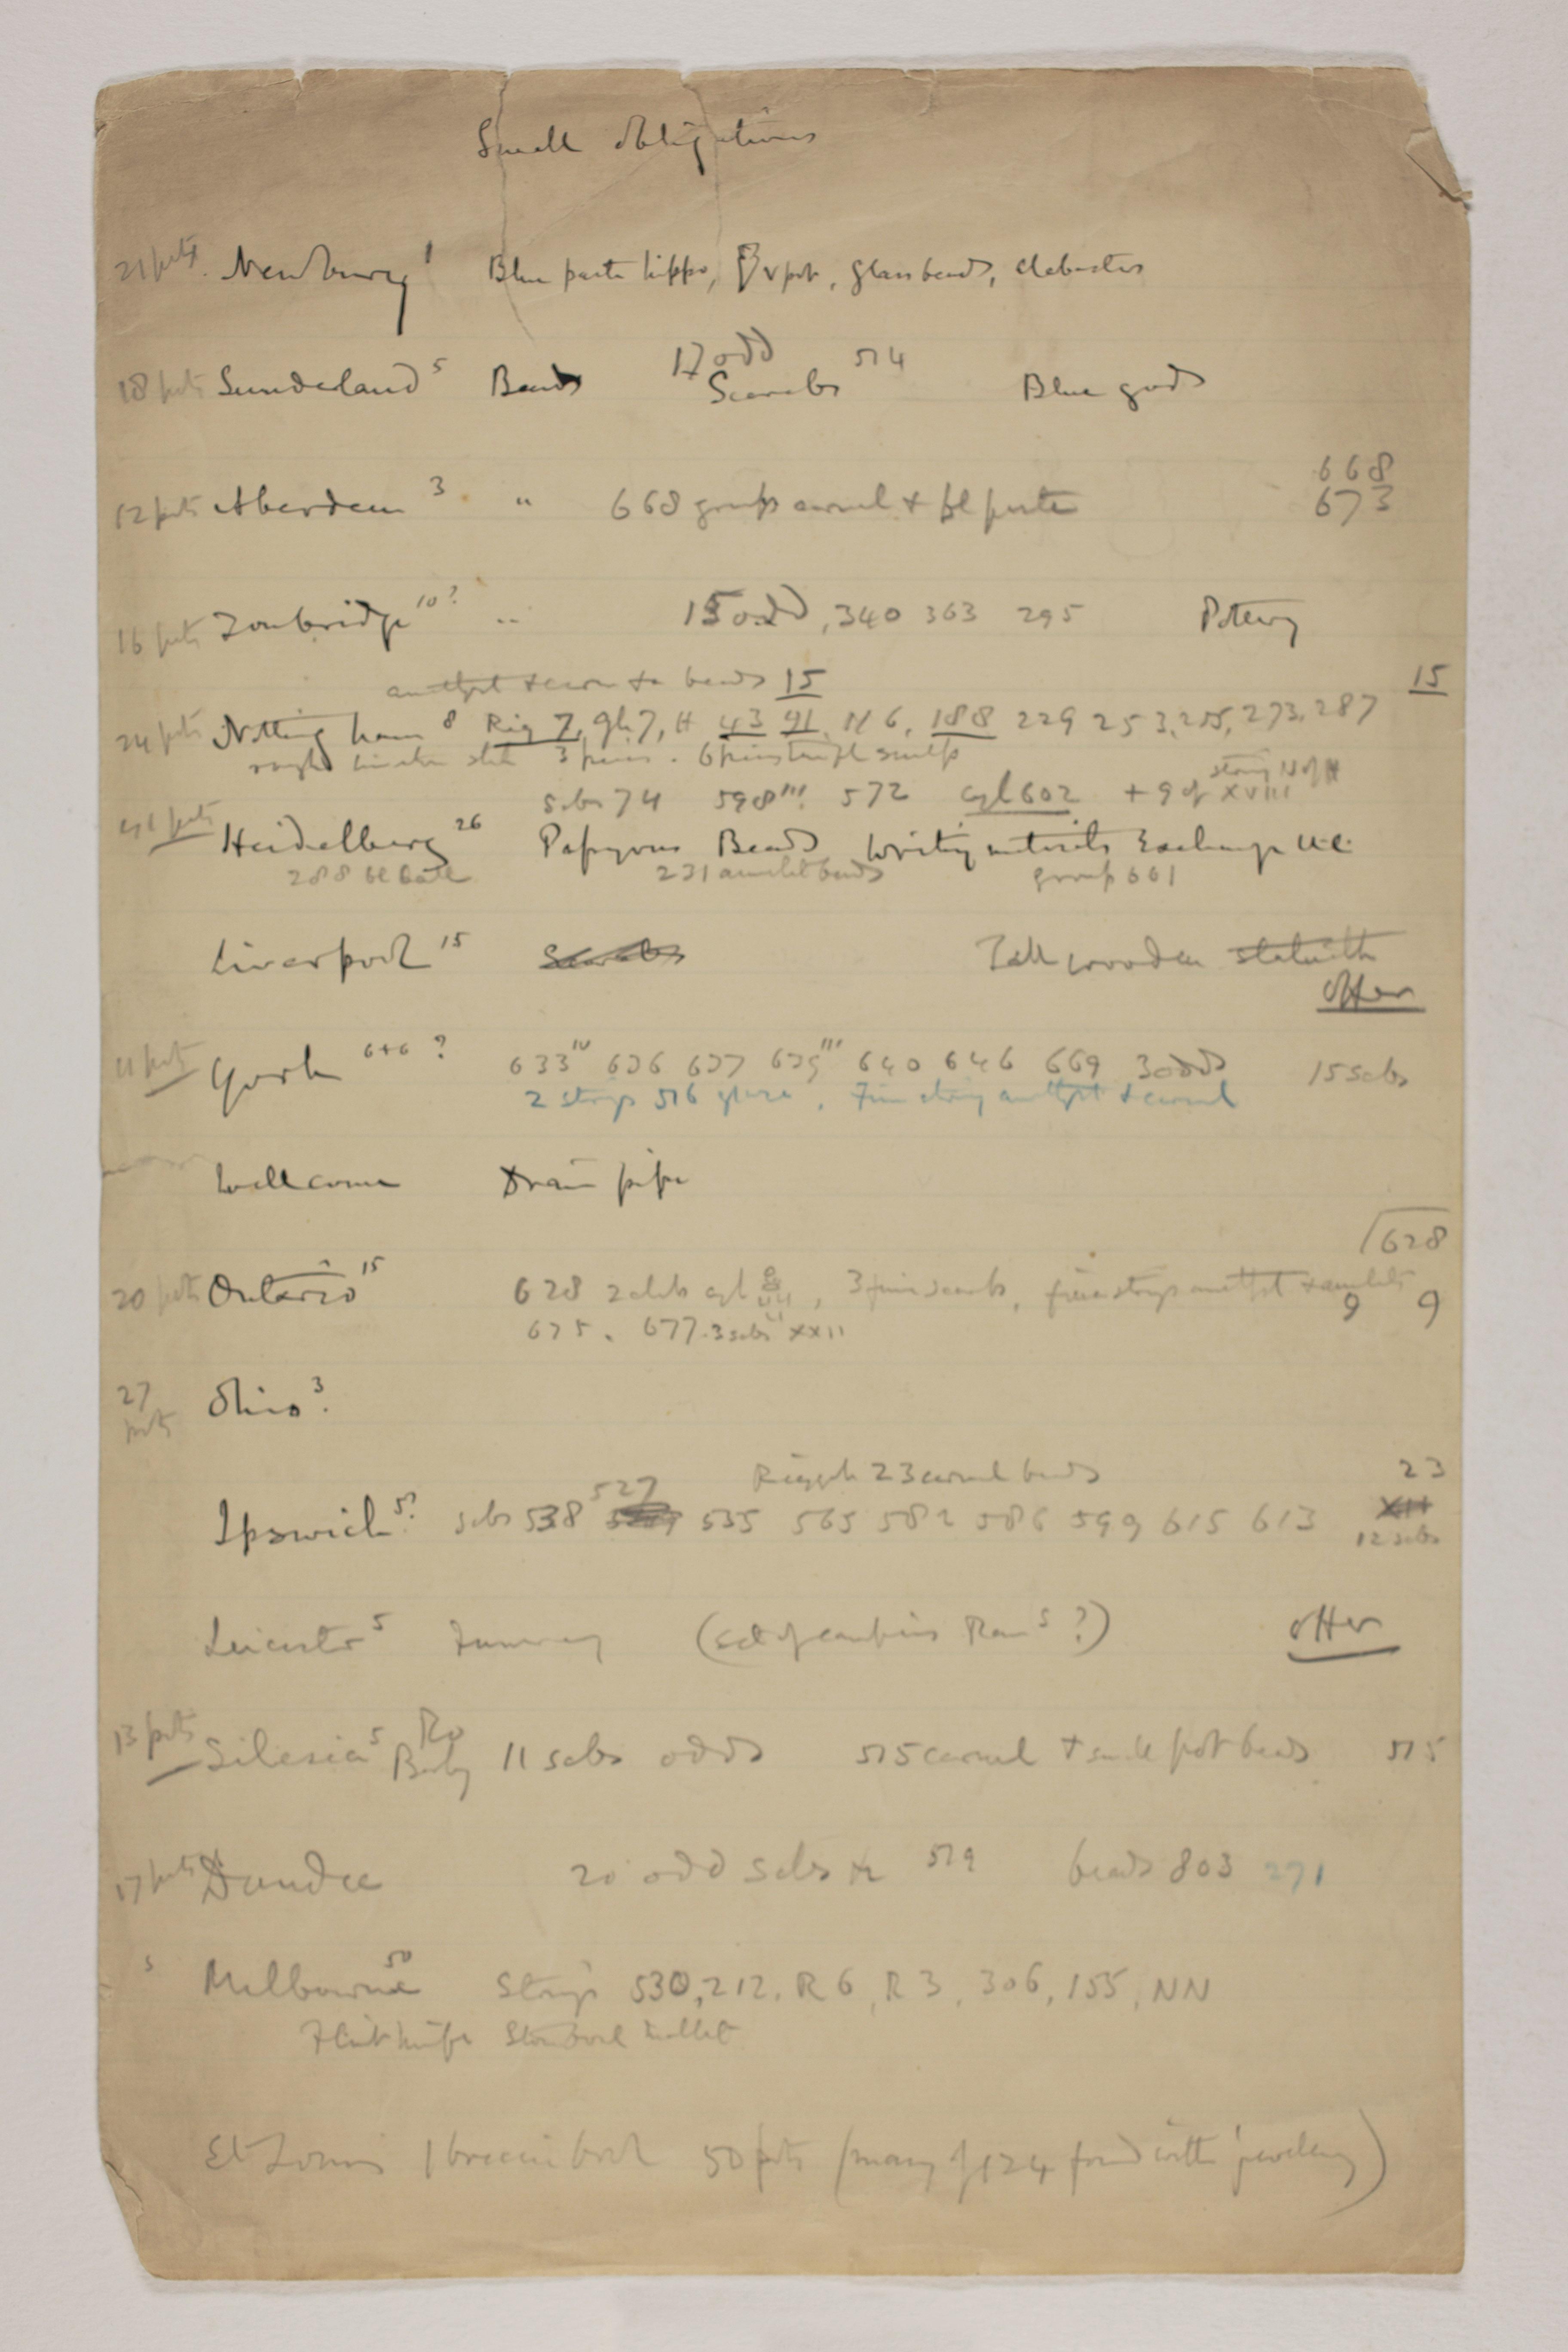 1913-14 Lahun, Haraga Multiple institution list PMA/WFP1/D/22/11.2